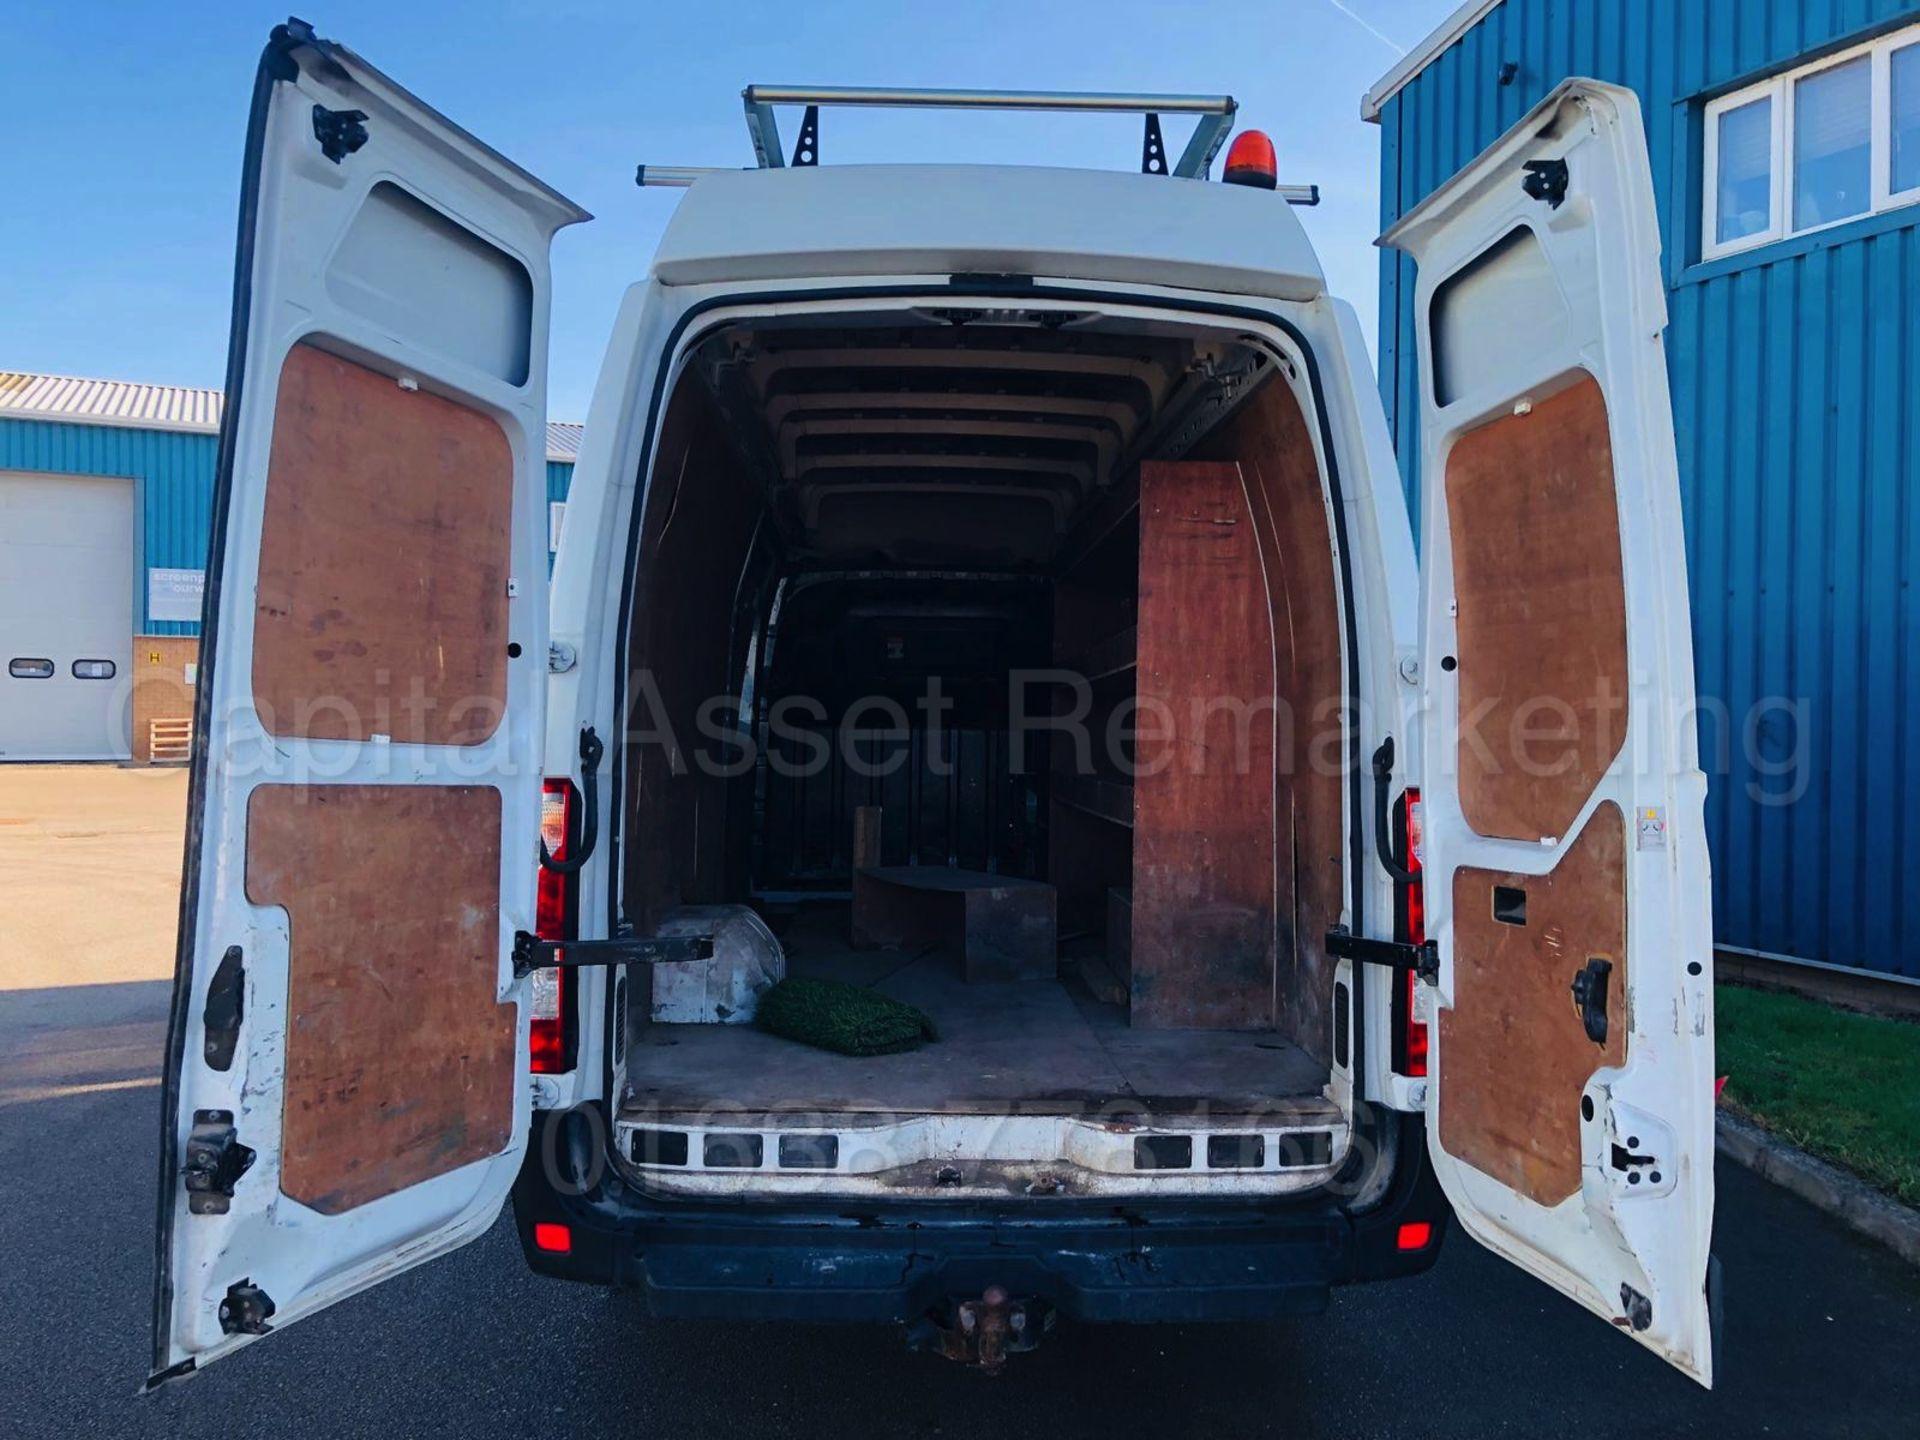 Lot 19 - VAUXHALL MOVANO R3500 DRW *L4 - EXTRA LONG WHEEL BASE* (2016 MODEL) '2.3 CDTI - 125 BHP - 6 SPEED'